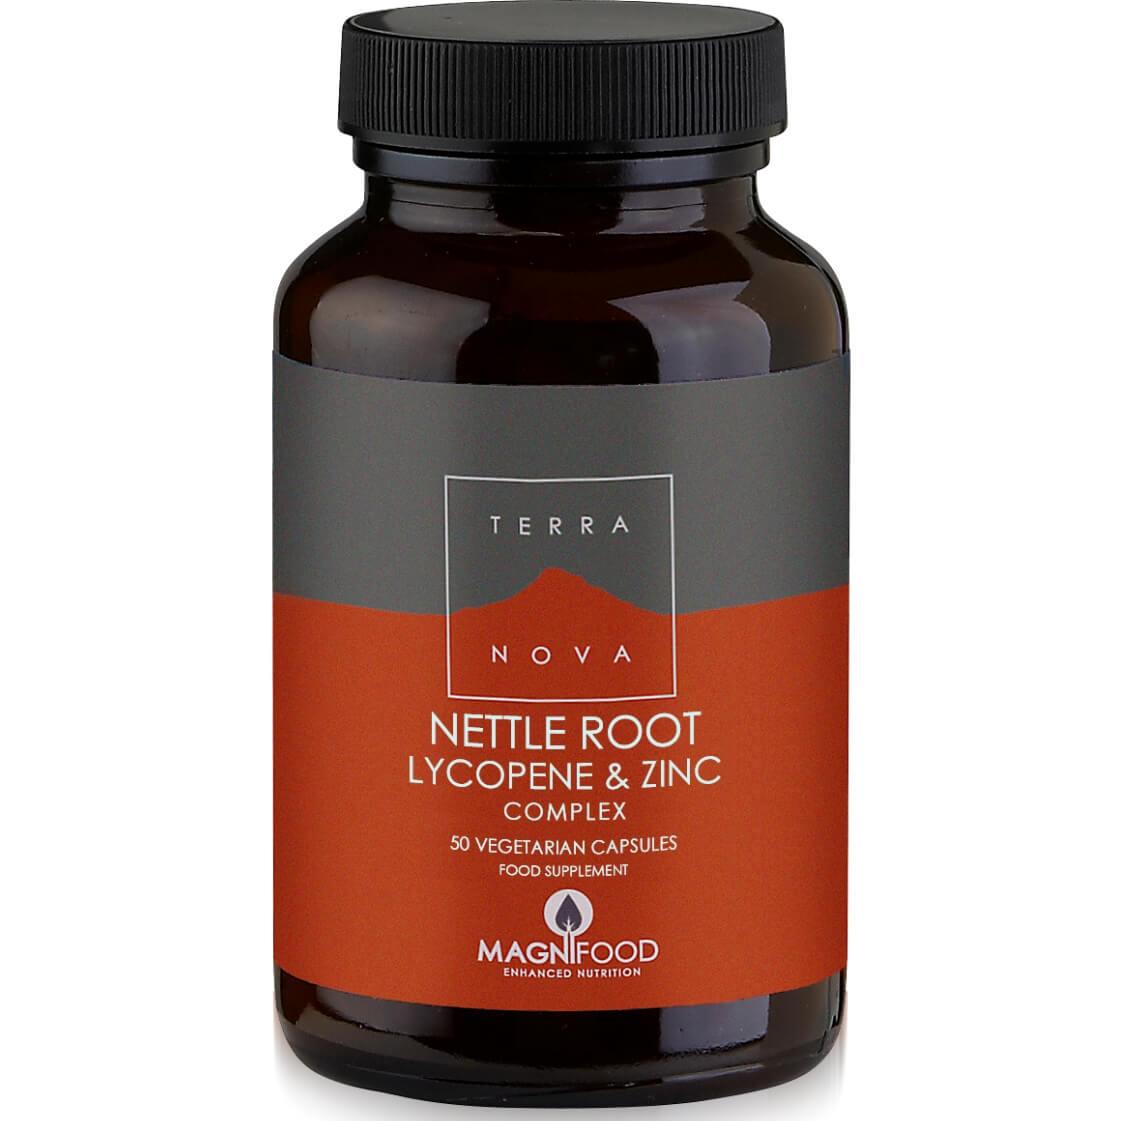 Terranova Nettle Root Lycopene & Zinc Complex Prostate Support Η Ολοκληρωμένη Σύνθεση Φυτικών Συστατικών για τον Προστάτη – 50 veg.caps